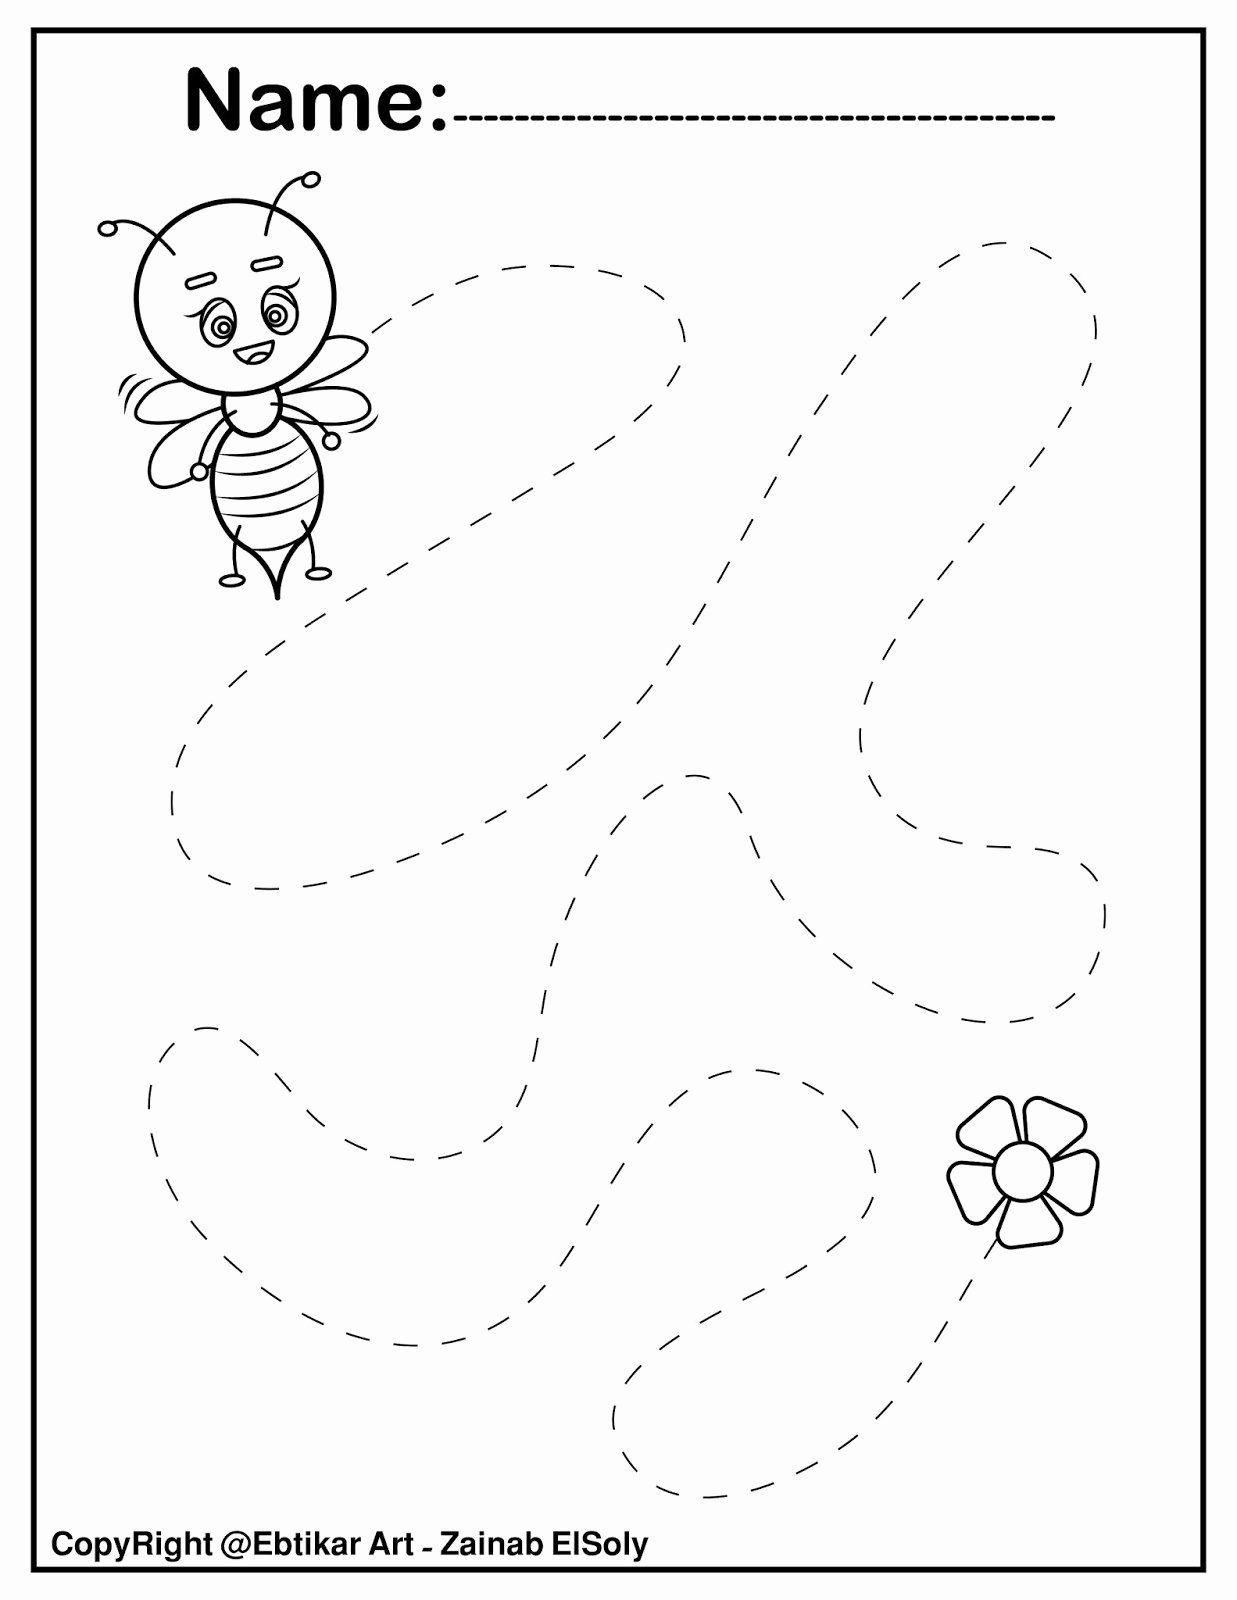 Dltk Worksheets For Preschoolers